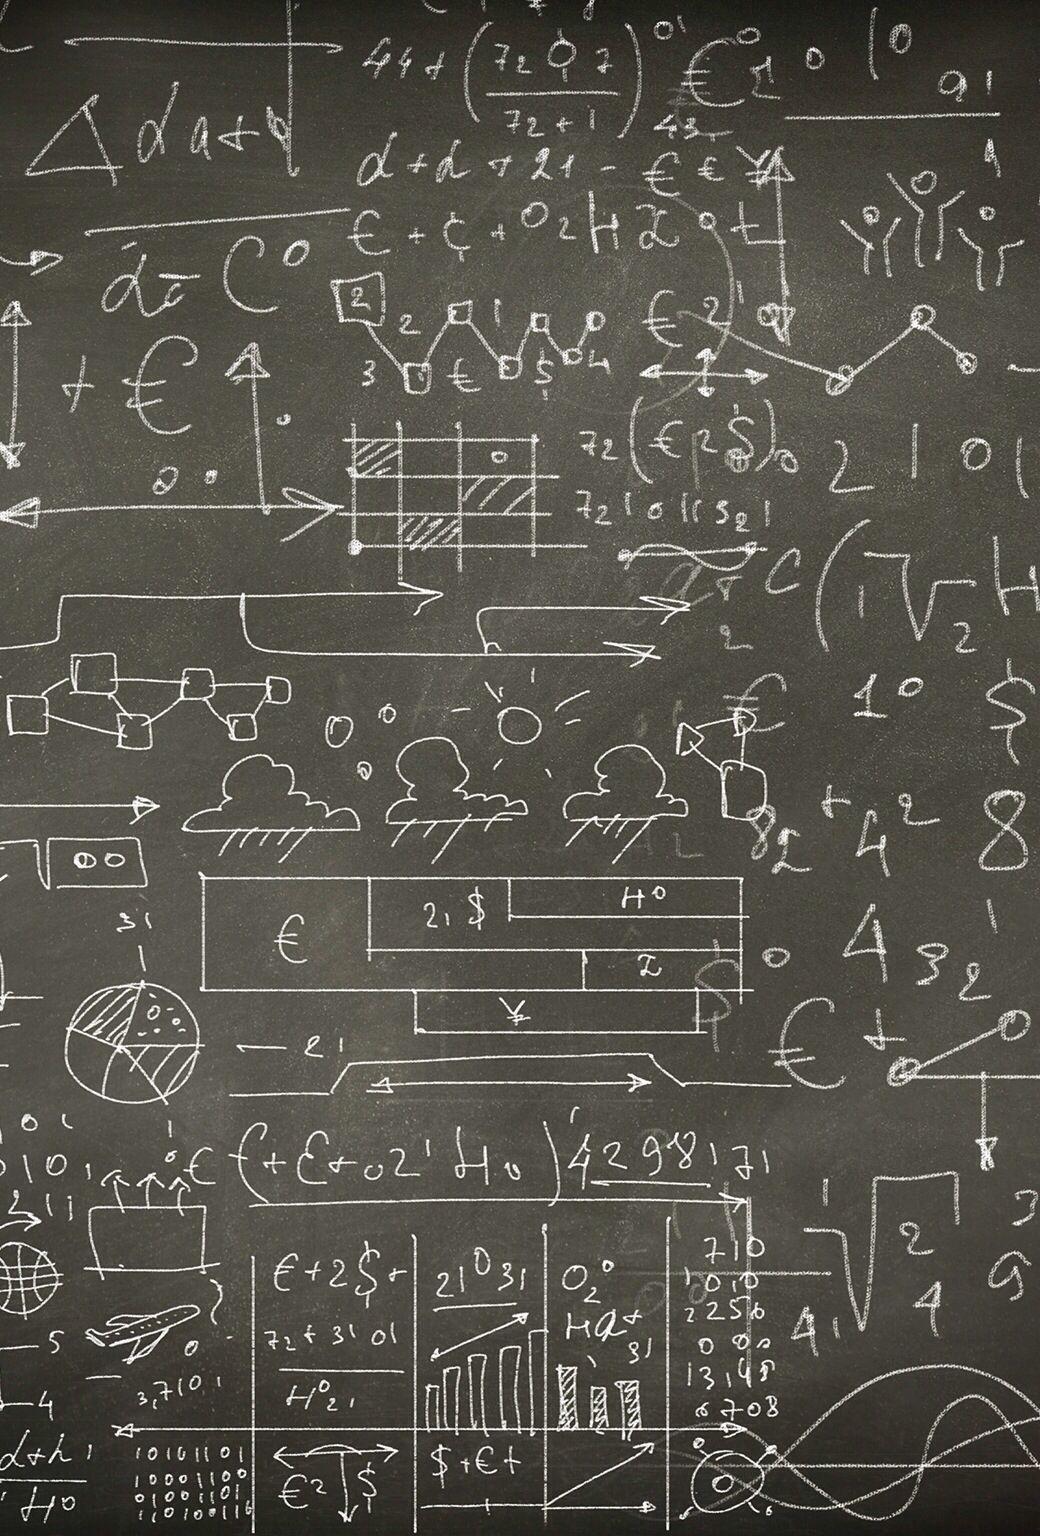 Math Equation Chalkboard IOS 7 Wallpaper